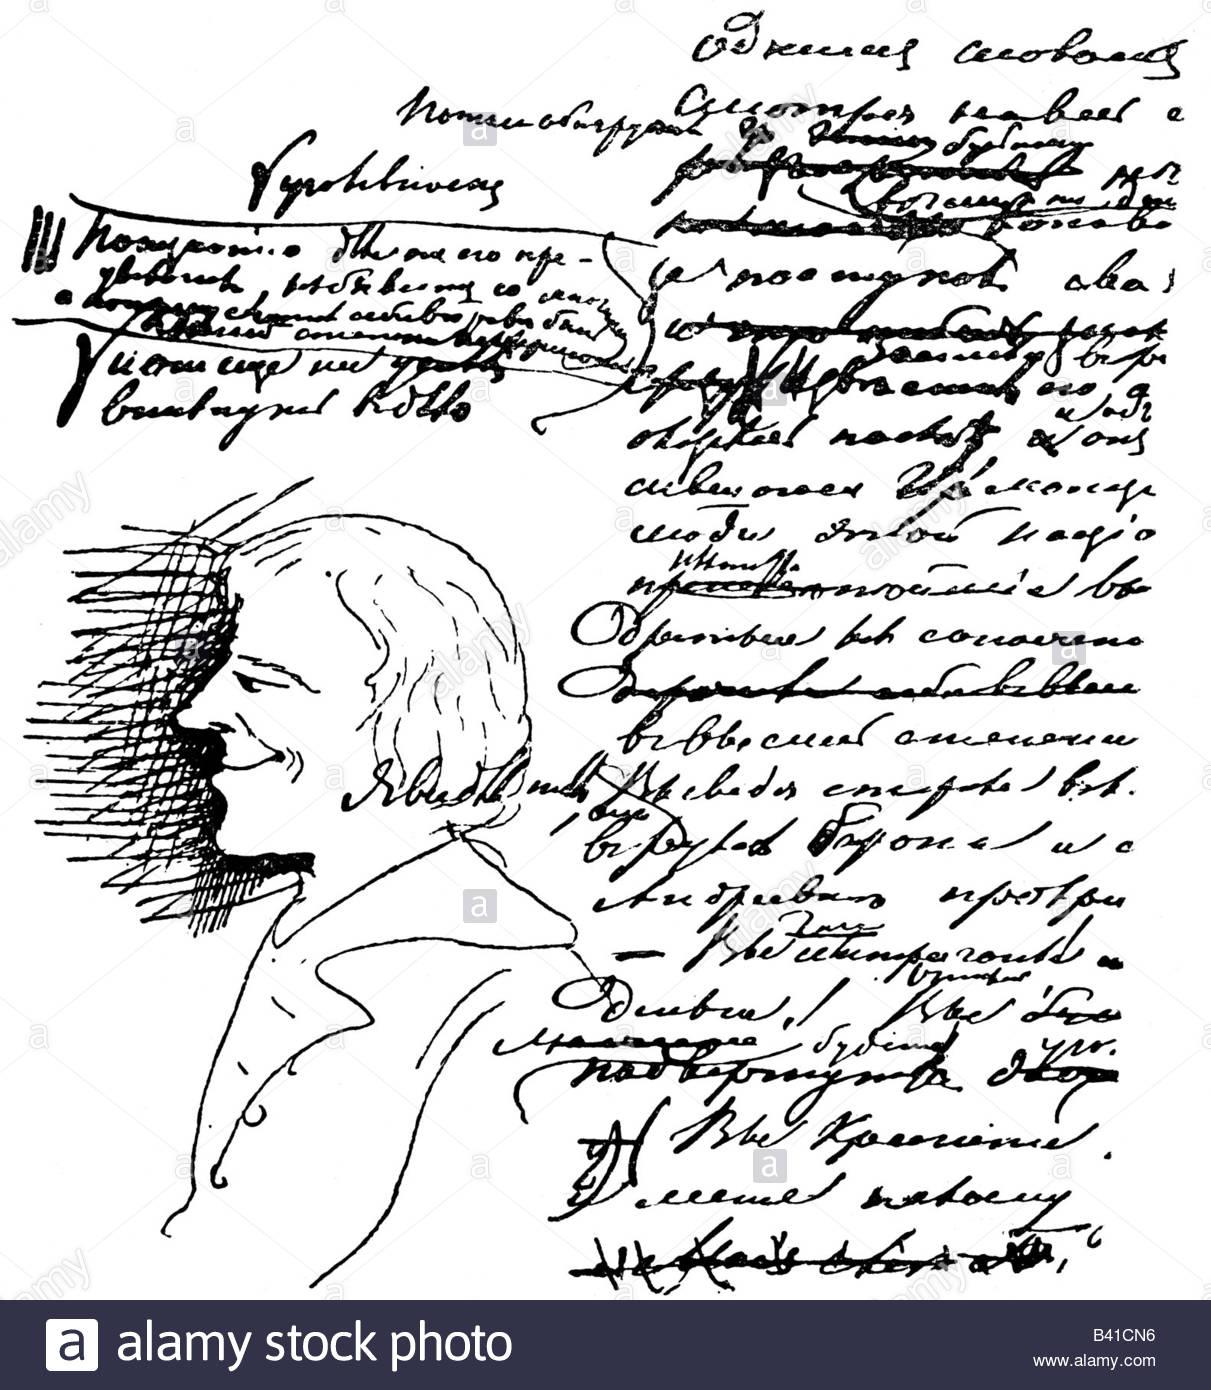 1211x1390 Dostoevsky, Fyodor Mikhailovich, 11.11.1821